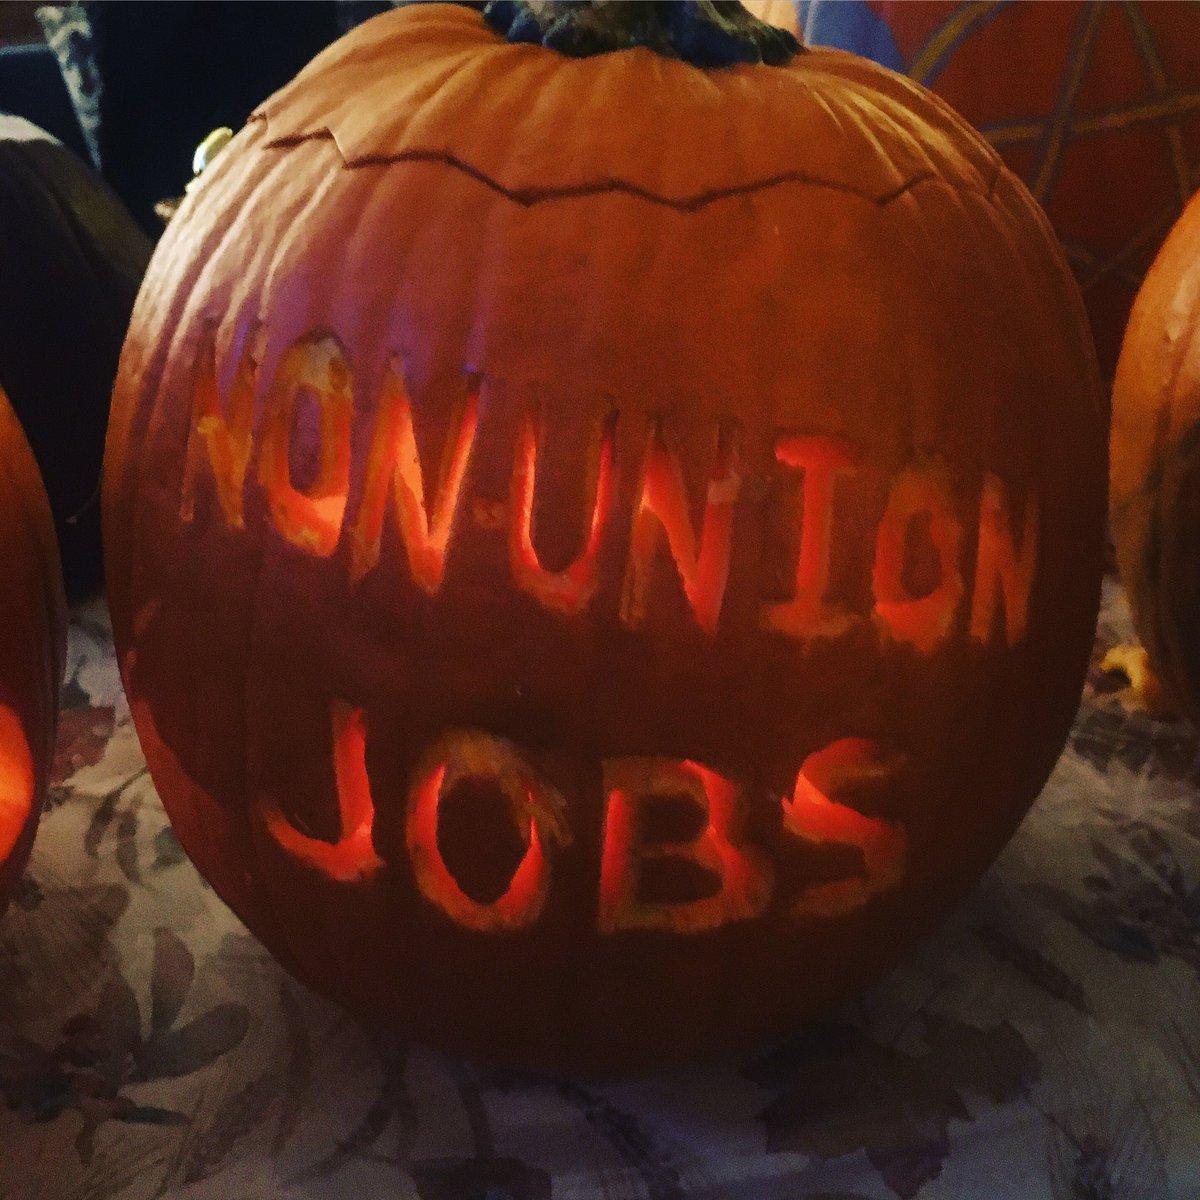 Made a scary pumpkin 🎃